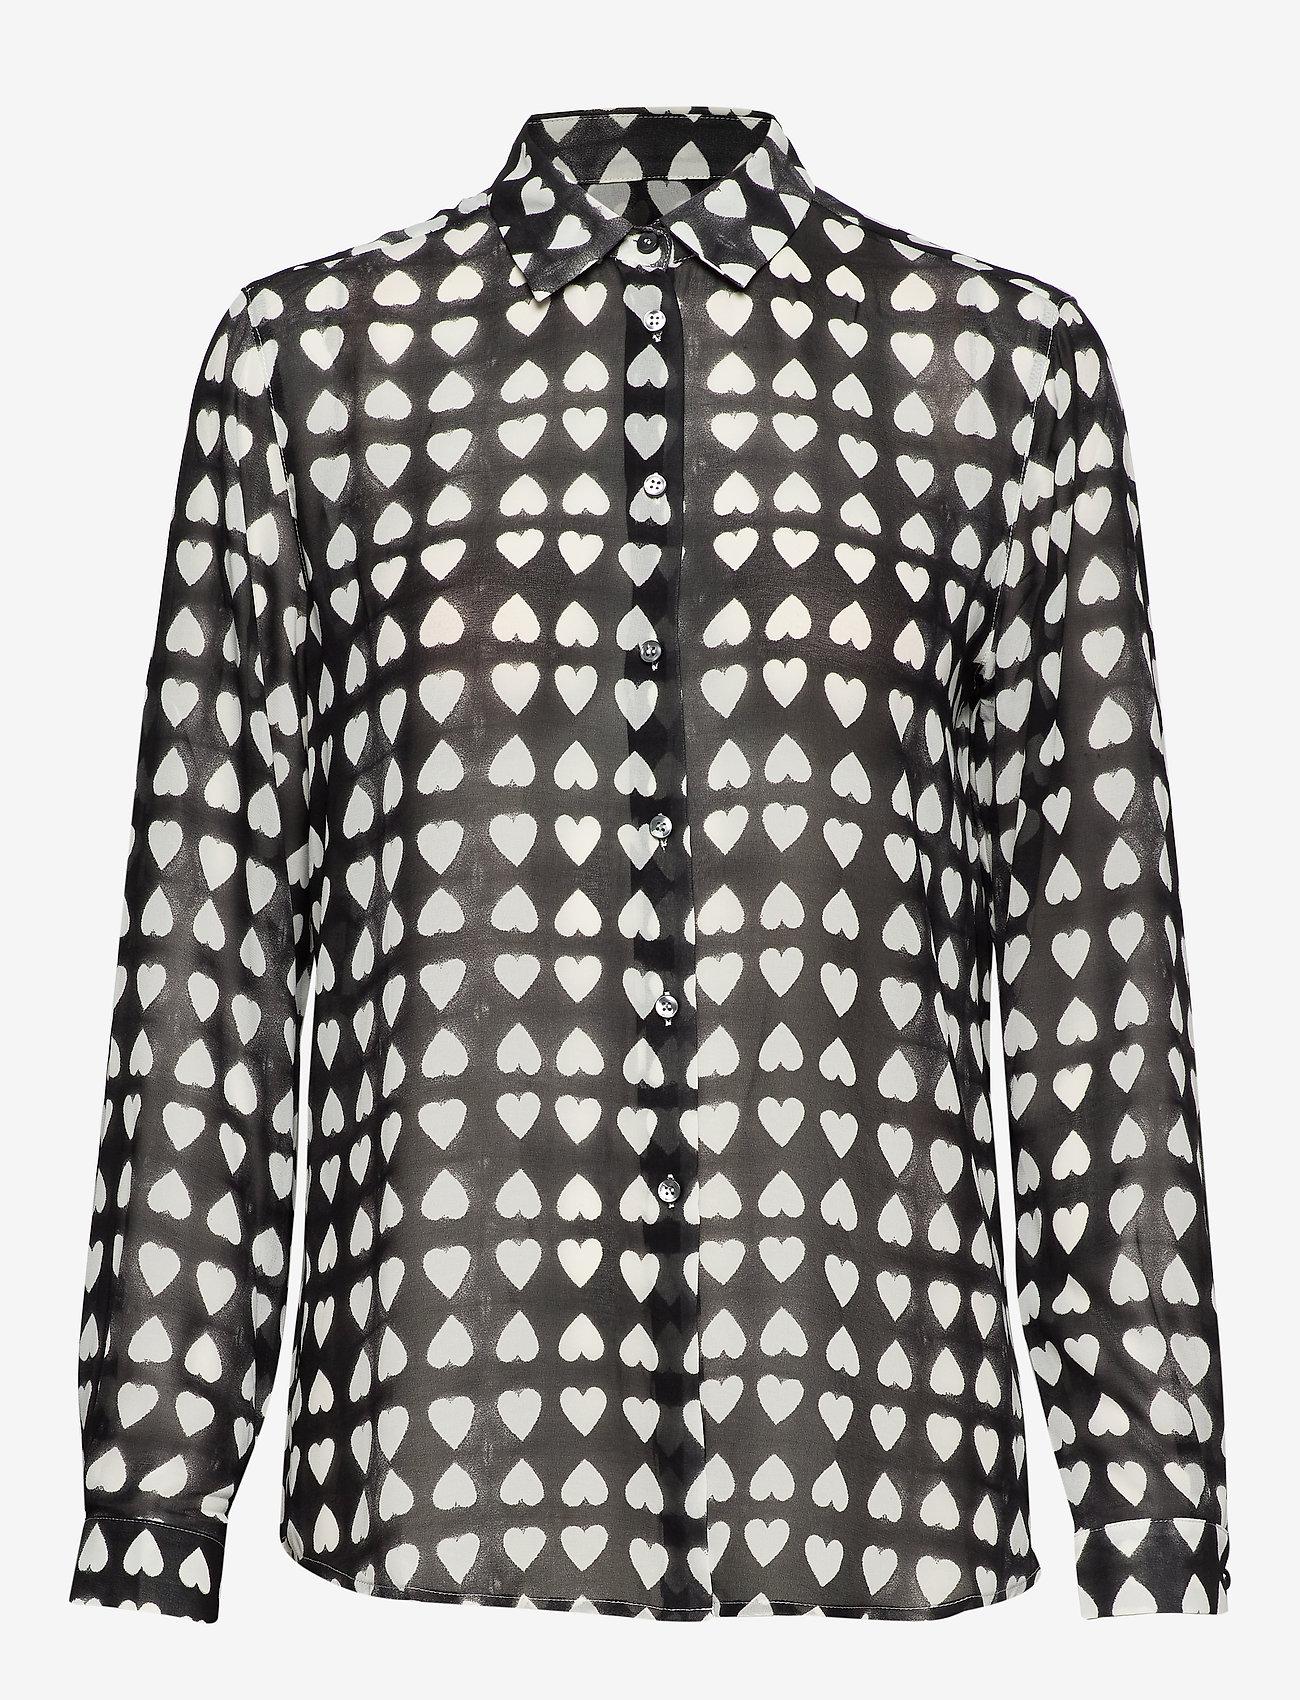 Whyred - KAROLINA DYED HEART - chemises à manches longues - black - 0